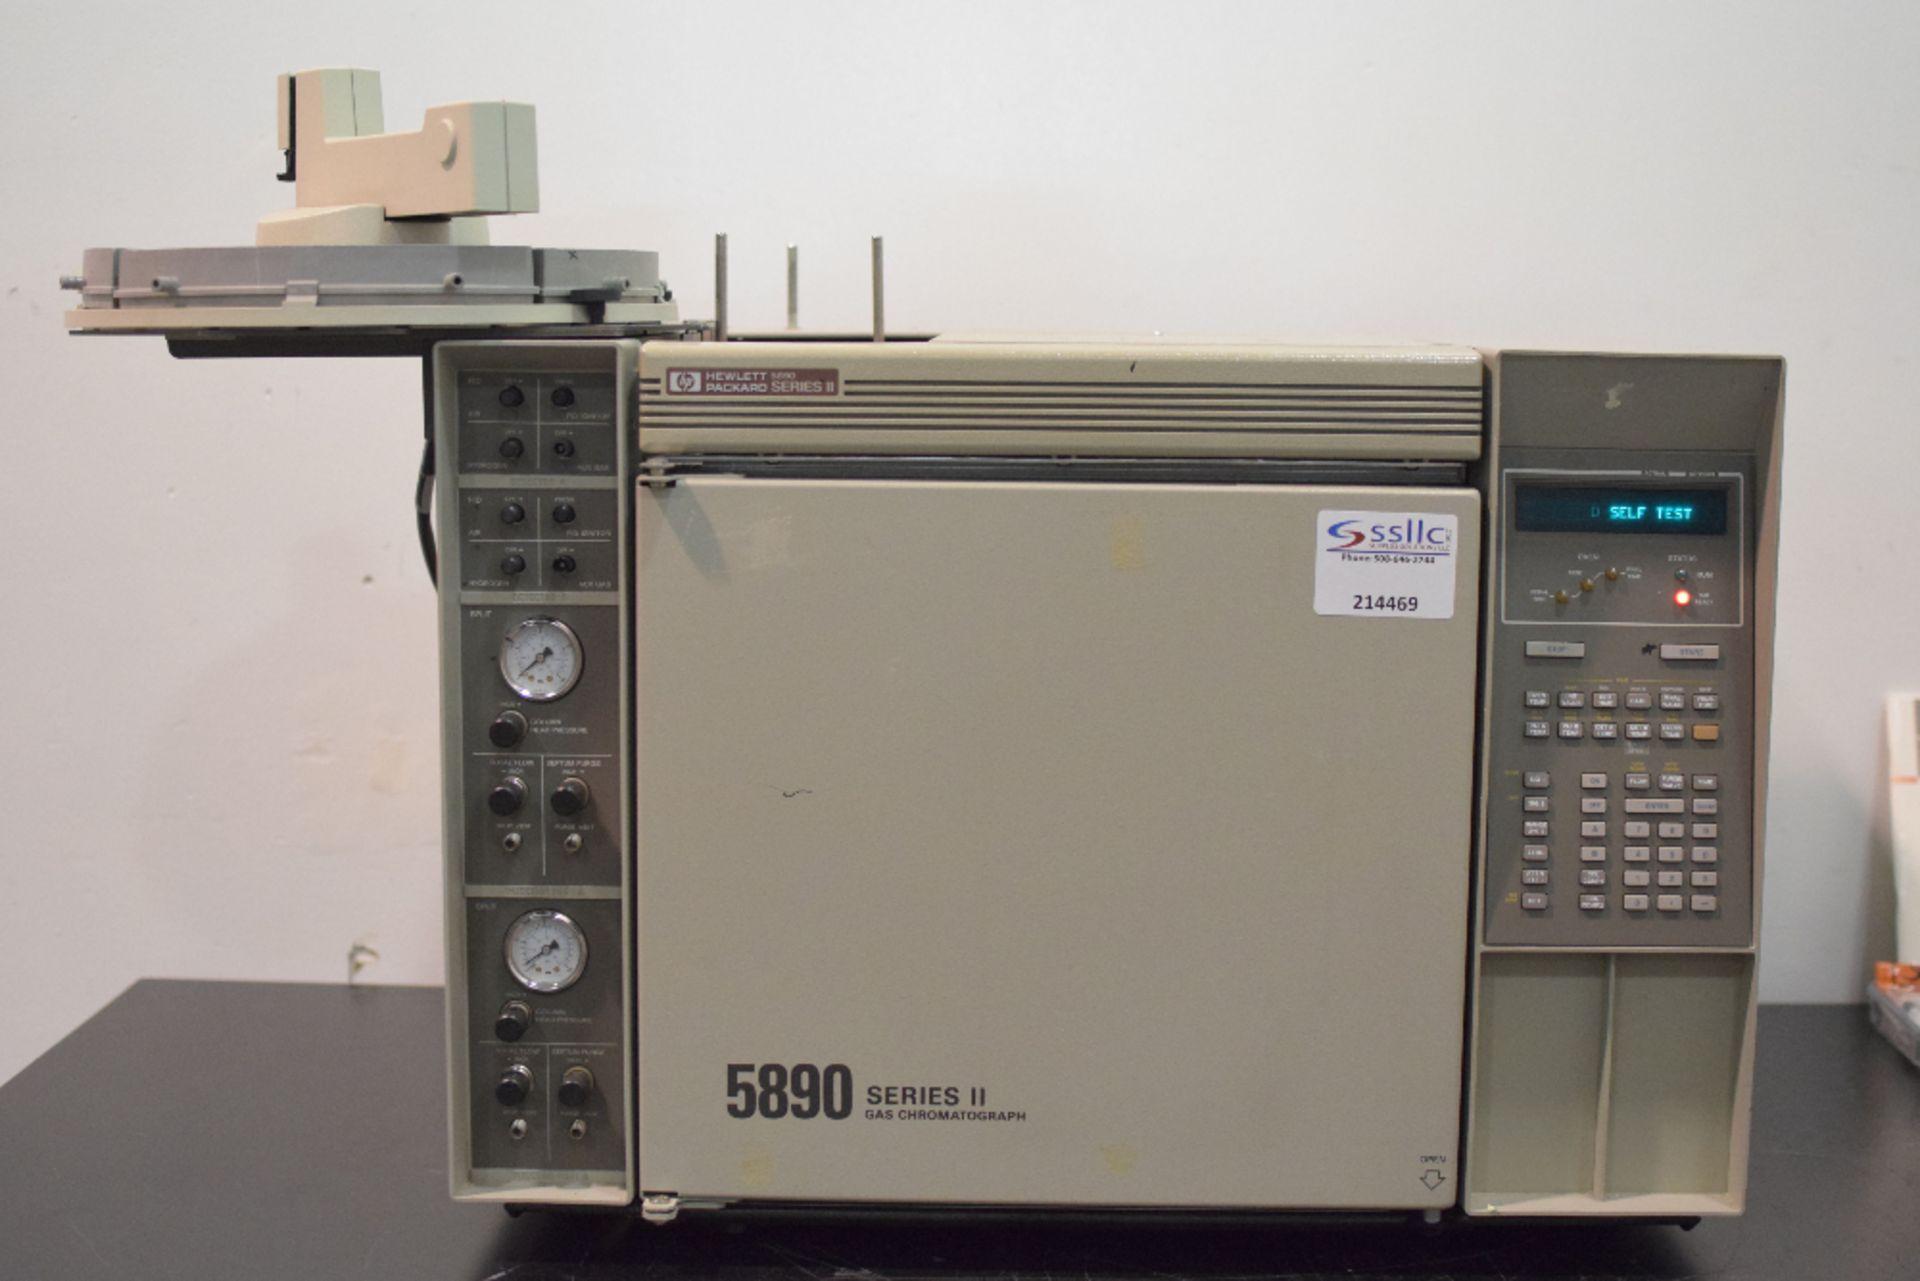 Hewlett Packard 5890 Series II Gas Chromatograph - Image 2 of 4